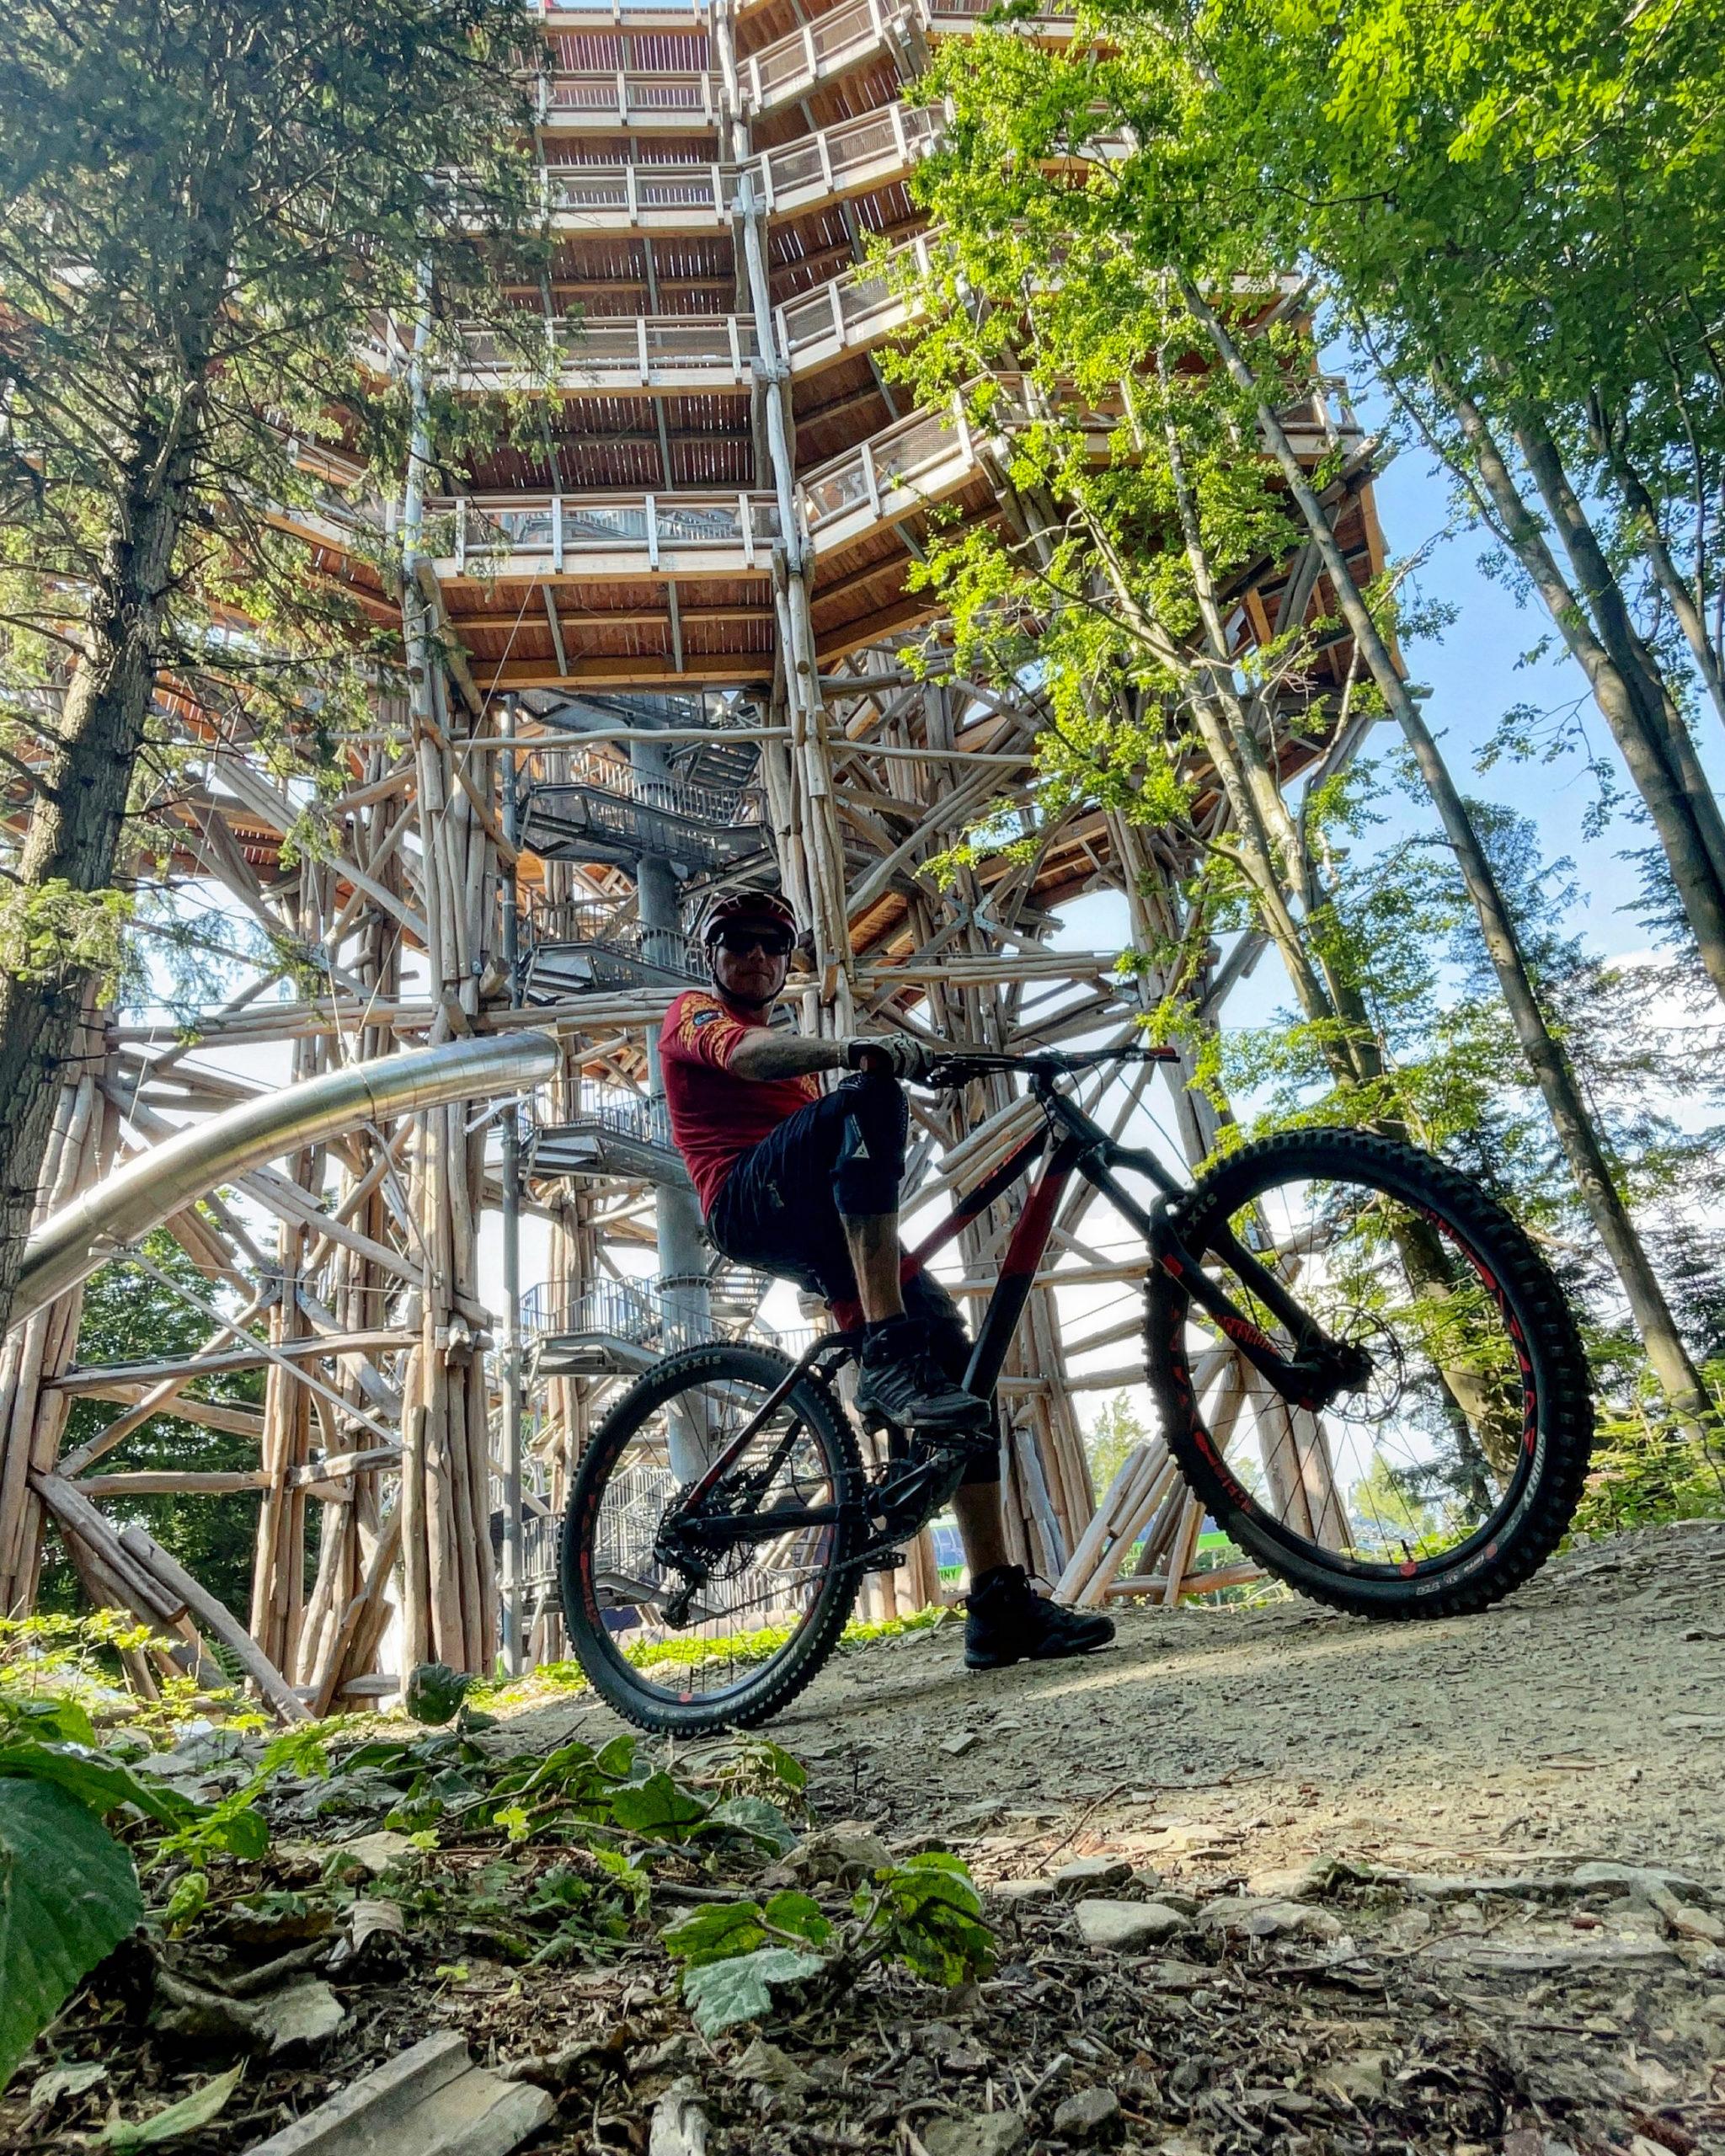 ebike centrum bike park słotwiny arena